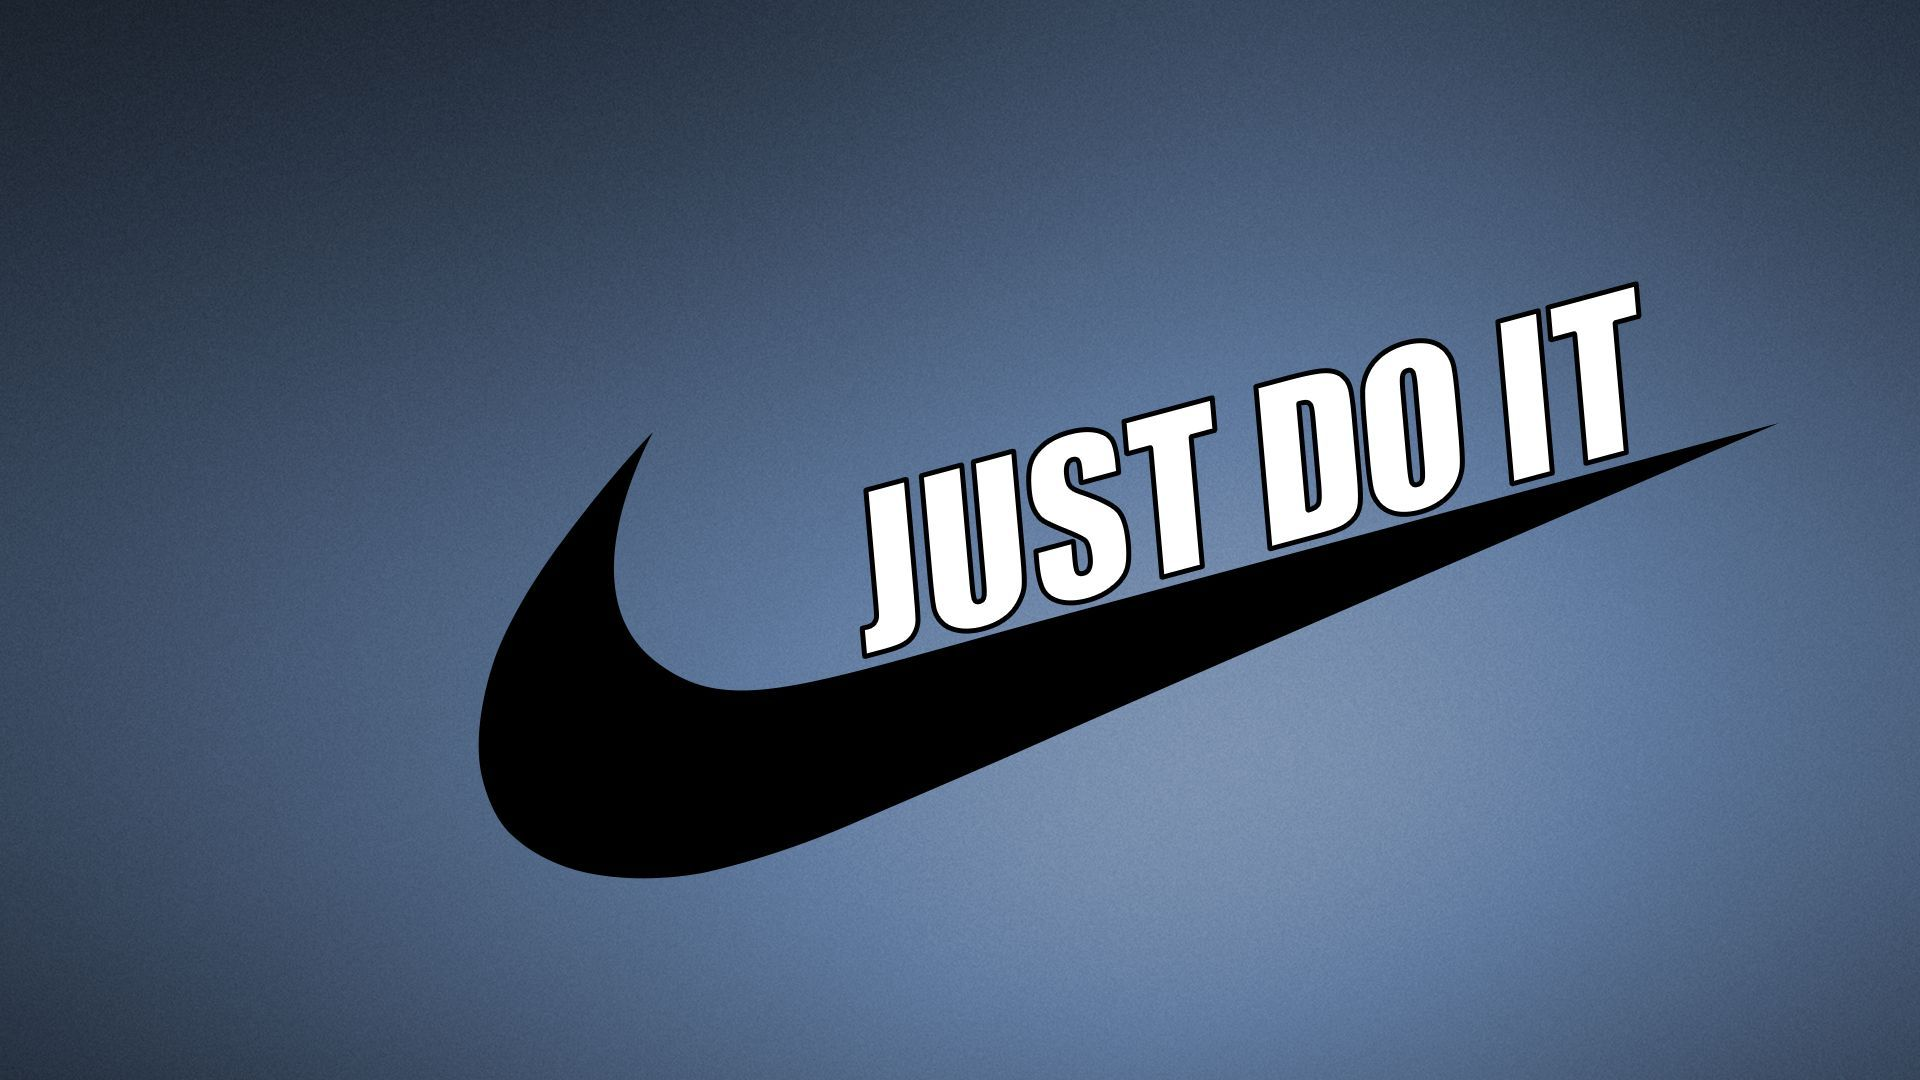 Sport Wallpaper Hd Nike Just Do It Wallpapers Wide At Bozhuwallpaper